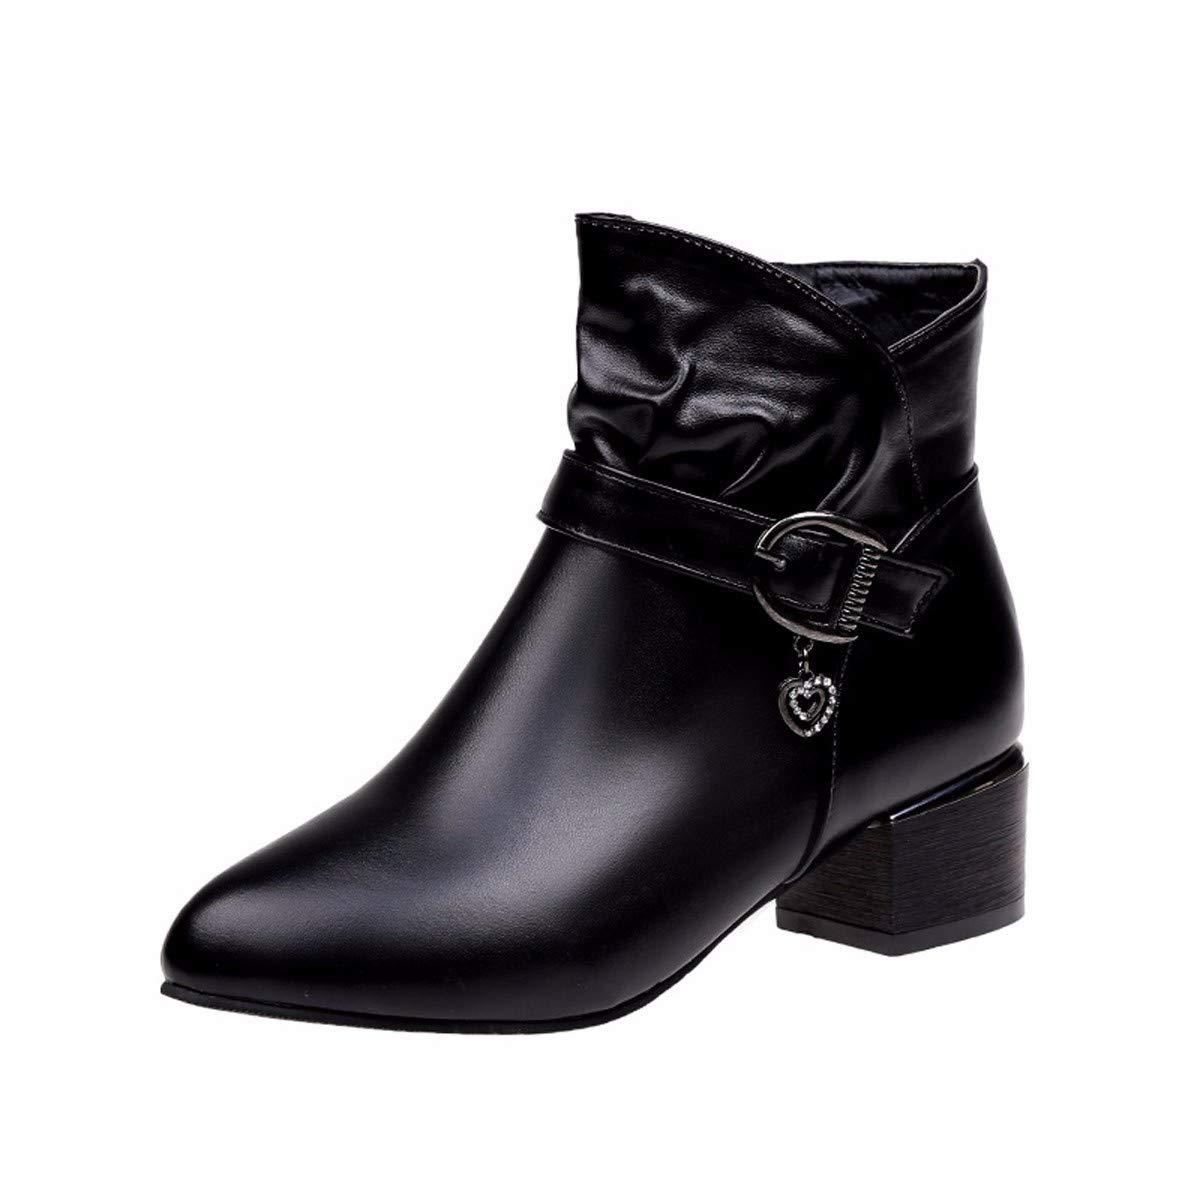 LBTSQ Damenschuhe Gürtel Schuhe Heel 4Cm Einfache 100 Sätze Mode Flachem Absatz Runden Kopf Stiefel